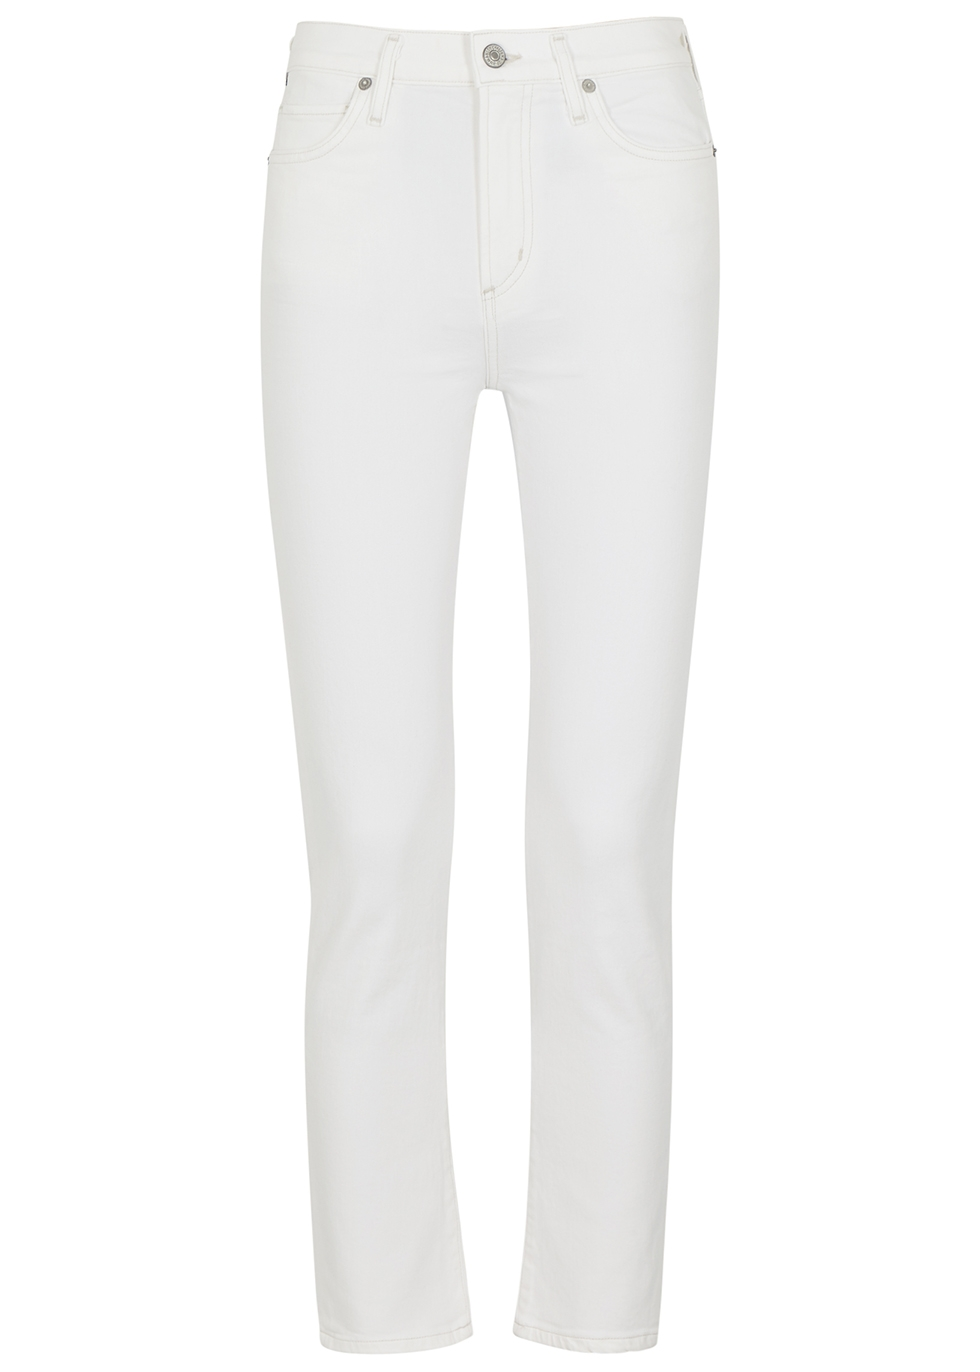 Harlow white slim-leg jeans